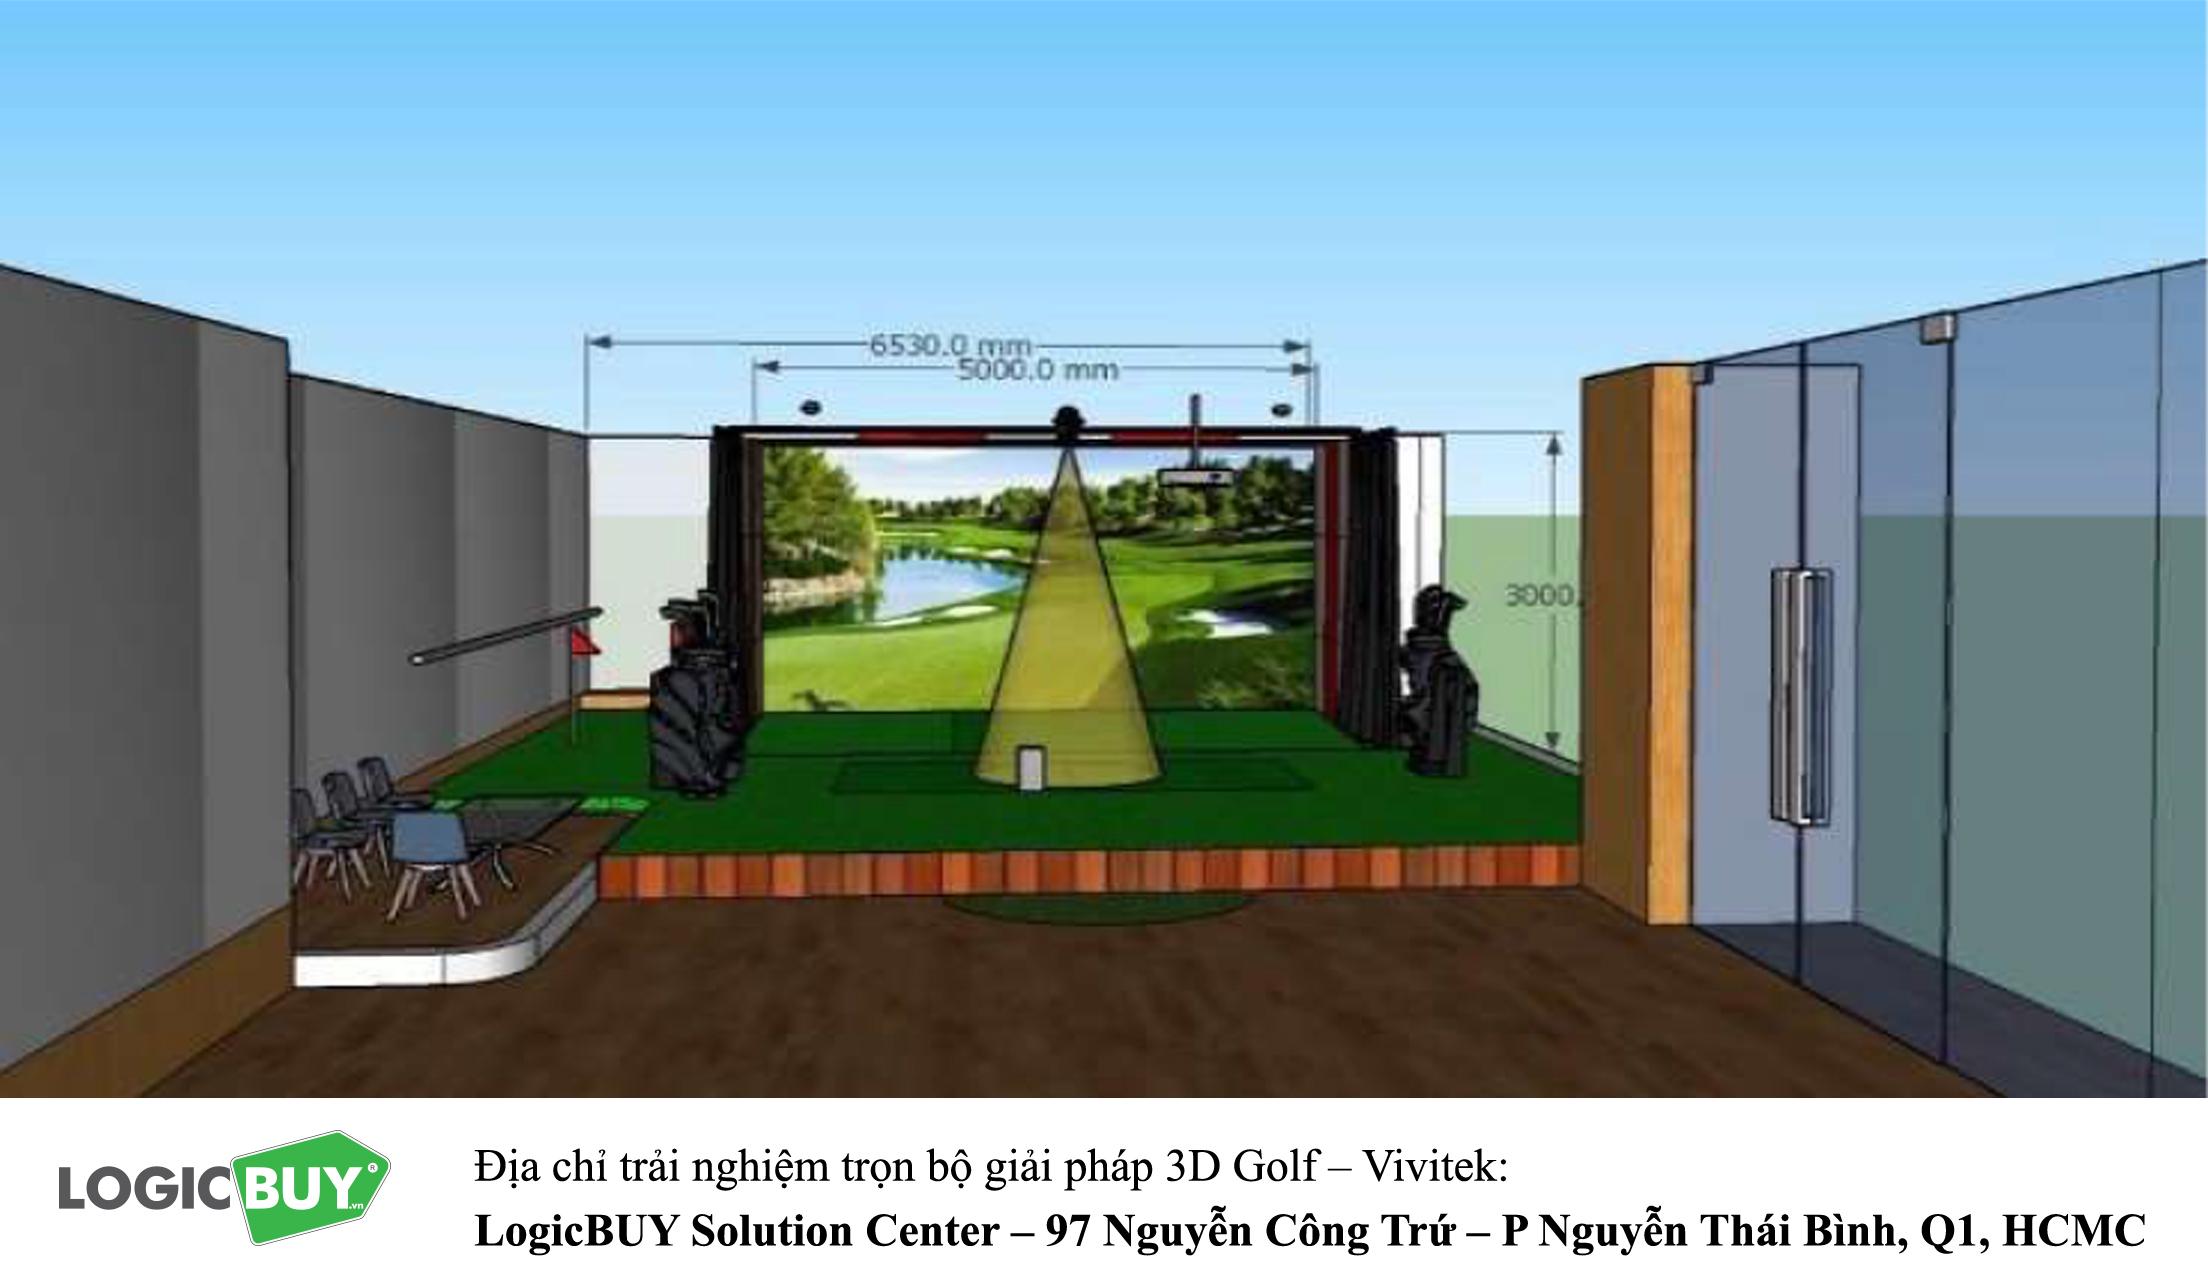 Phòng Golf 3D Vivitek 10